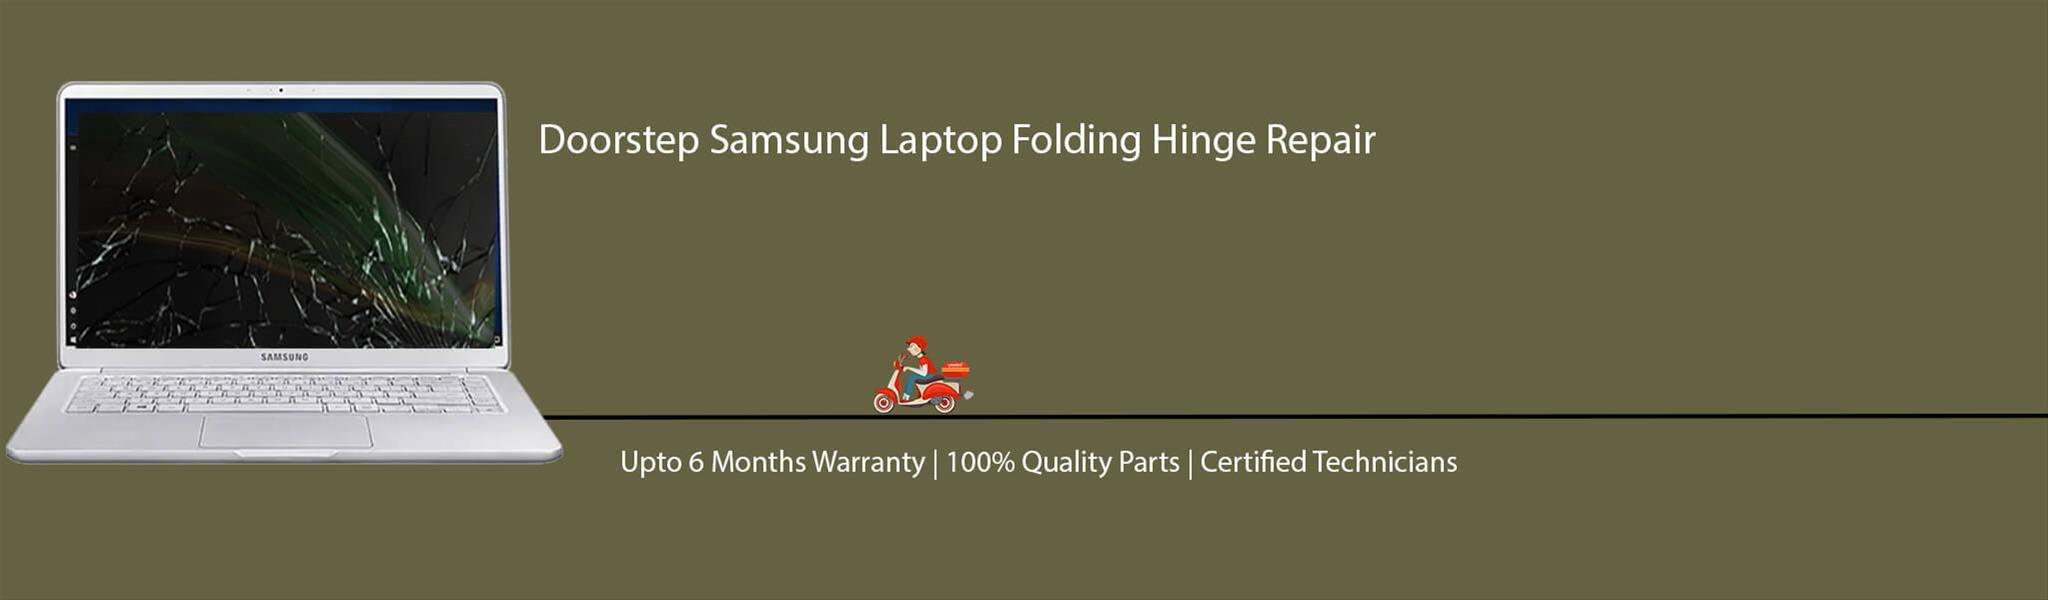 samsung-laptop-folding-hinge-repair.jpg